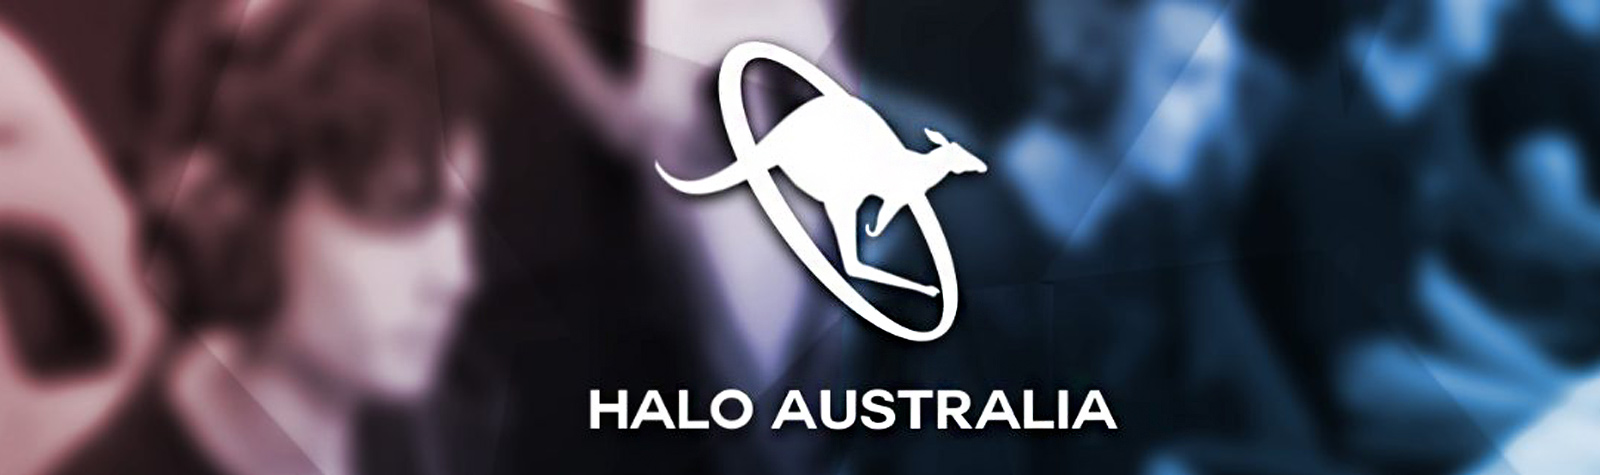 Halo Australia Queensland Logan H3 4v4 Tournament Top 8